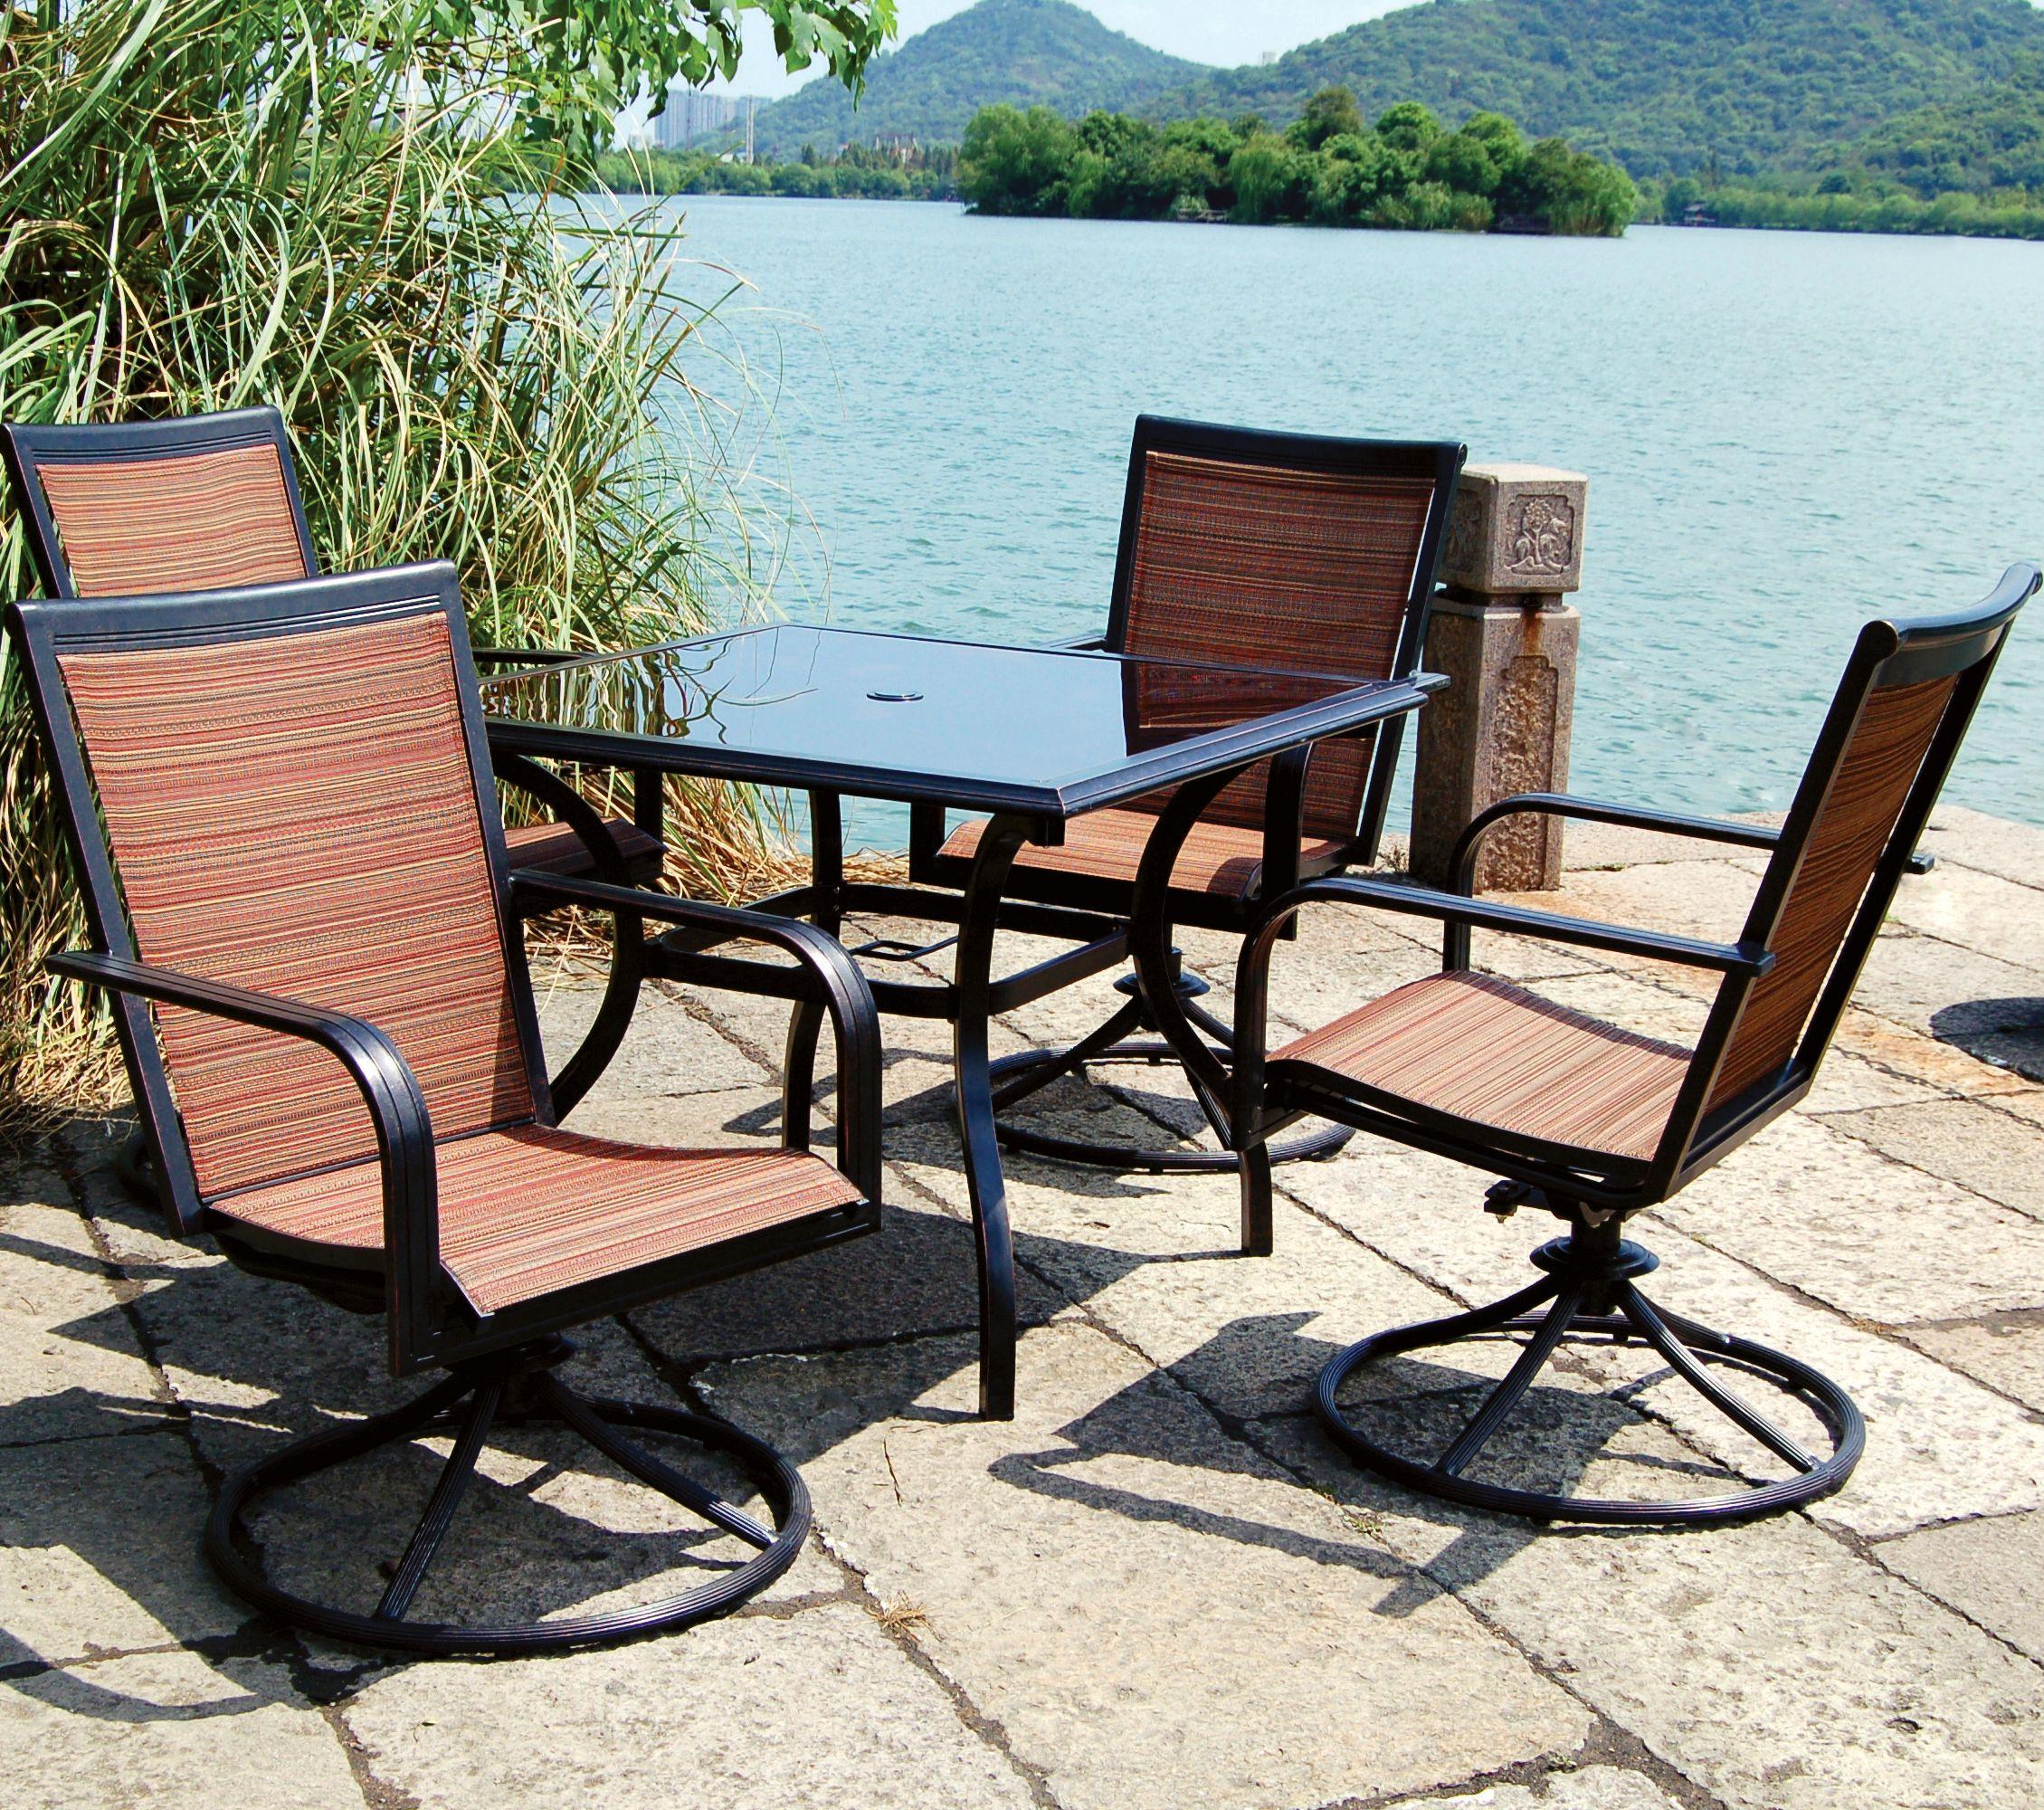 pin by danielle nicewander tully on patio ideas backyard rh pinterest com